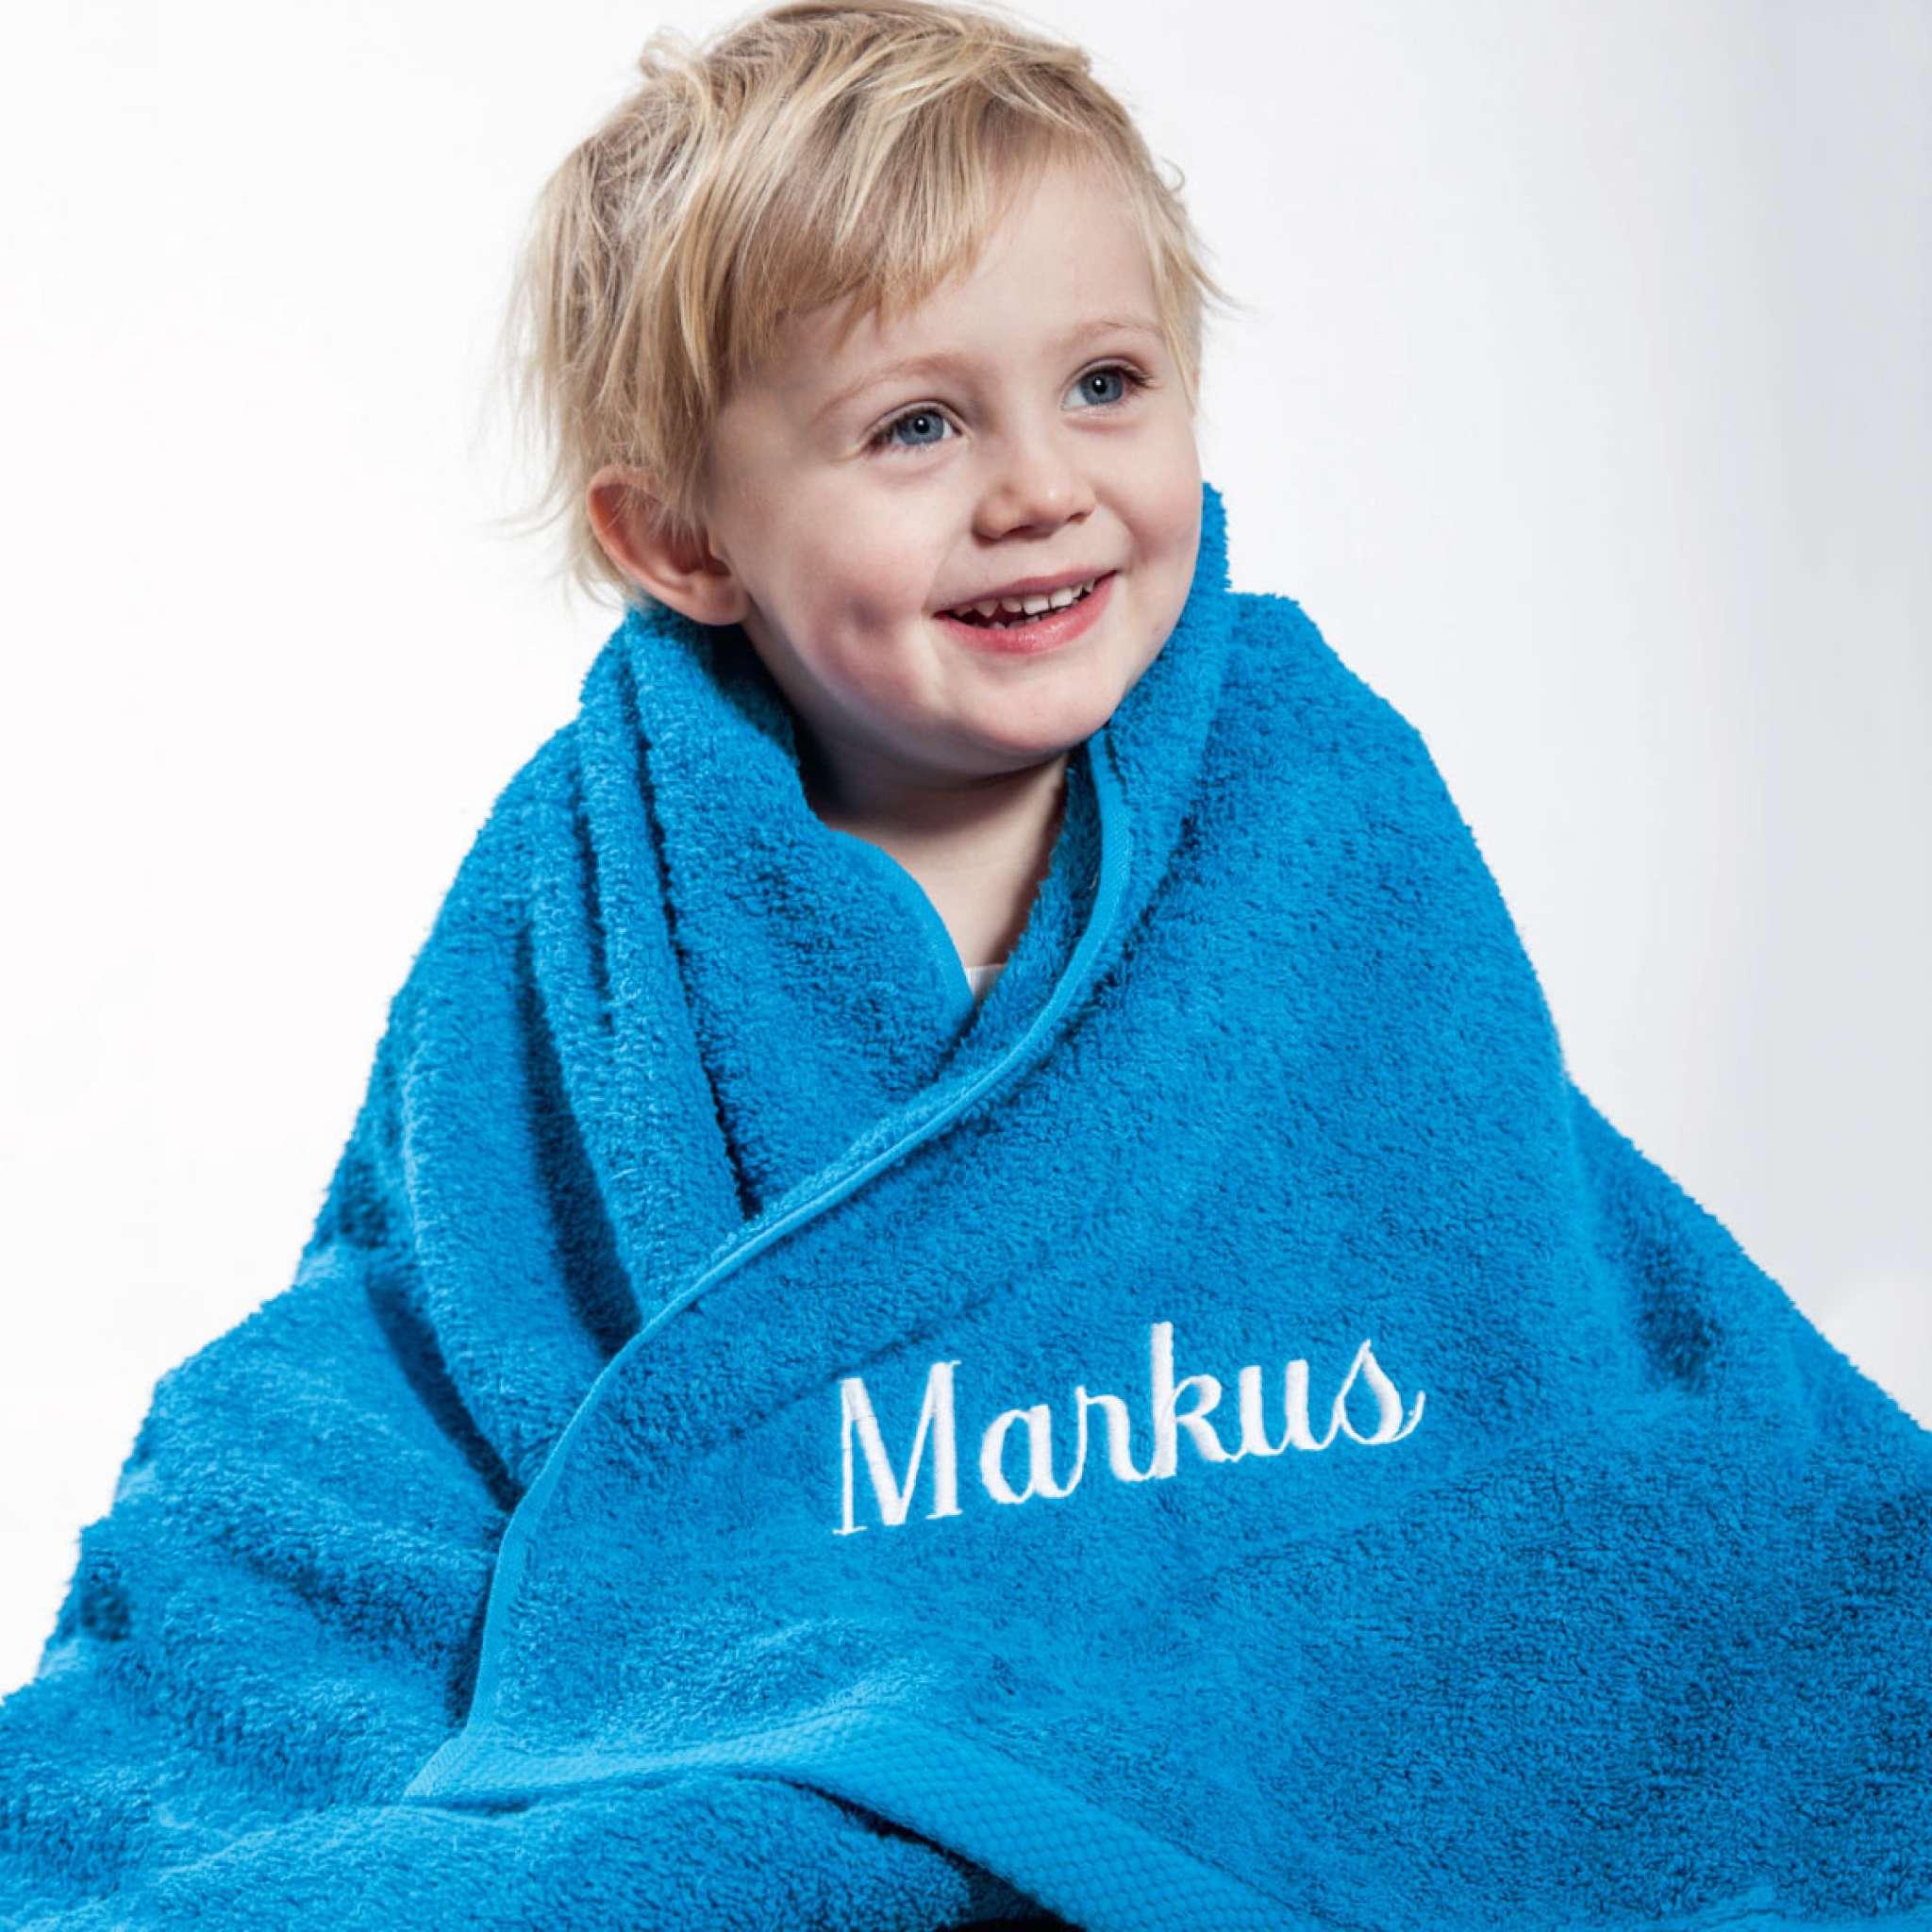 Superbonus: Pure exclusive Strandhåndkle